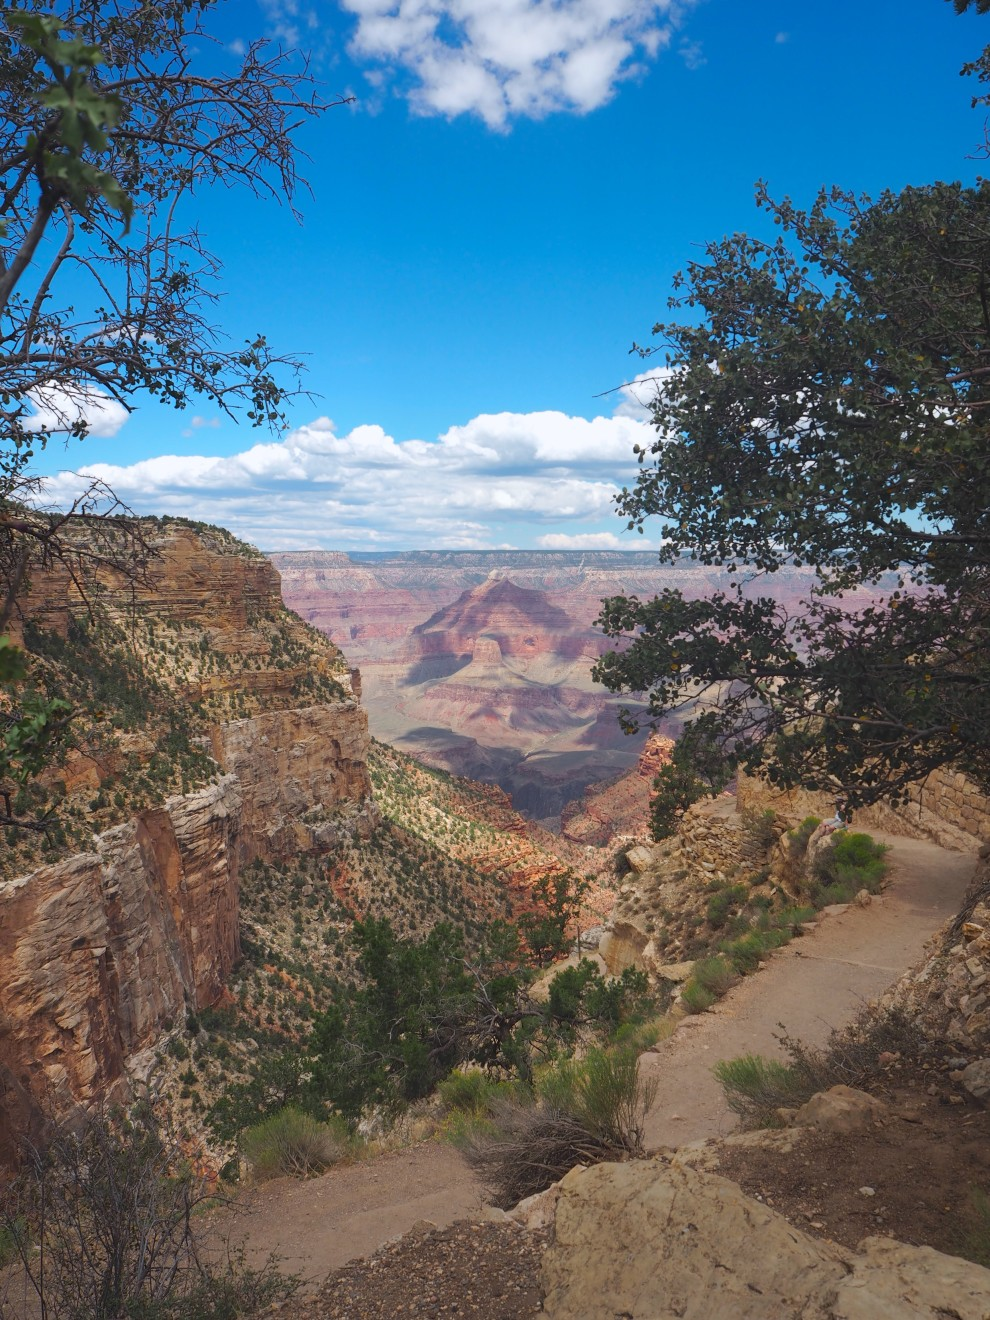 GRAND CANYON ARIZONA TRAVEL HOTSPOTS USA ROADTRIP